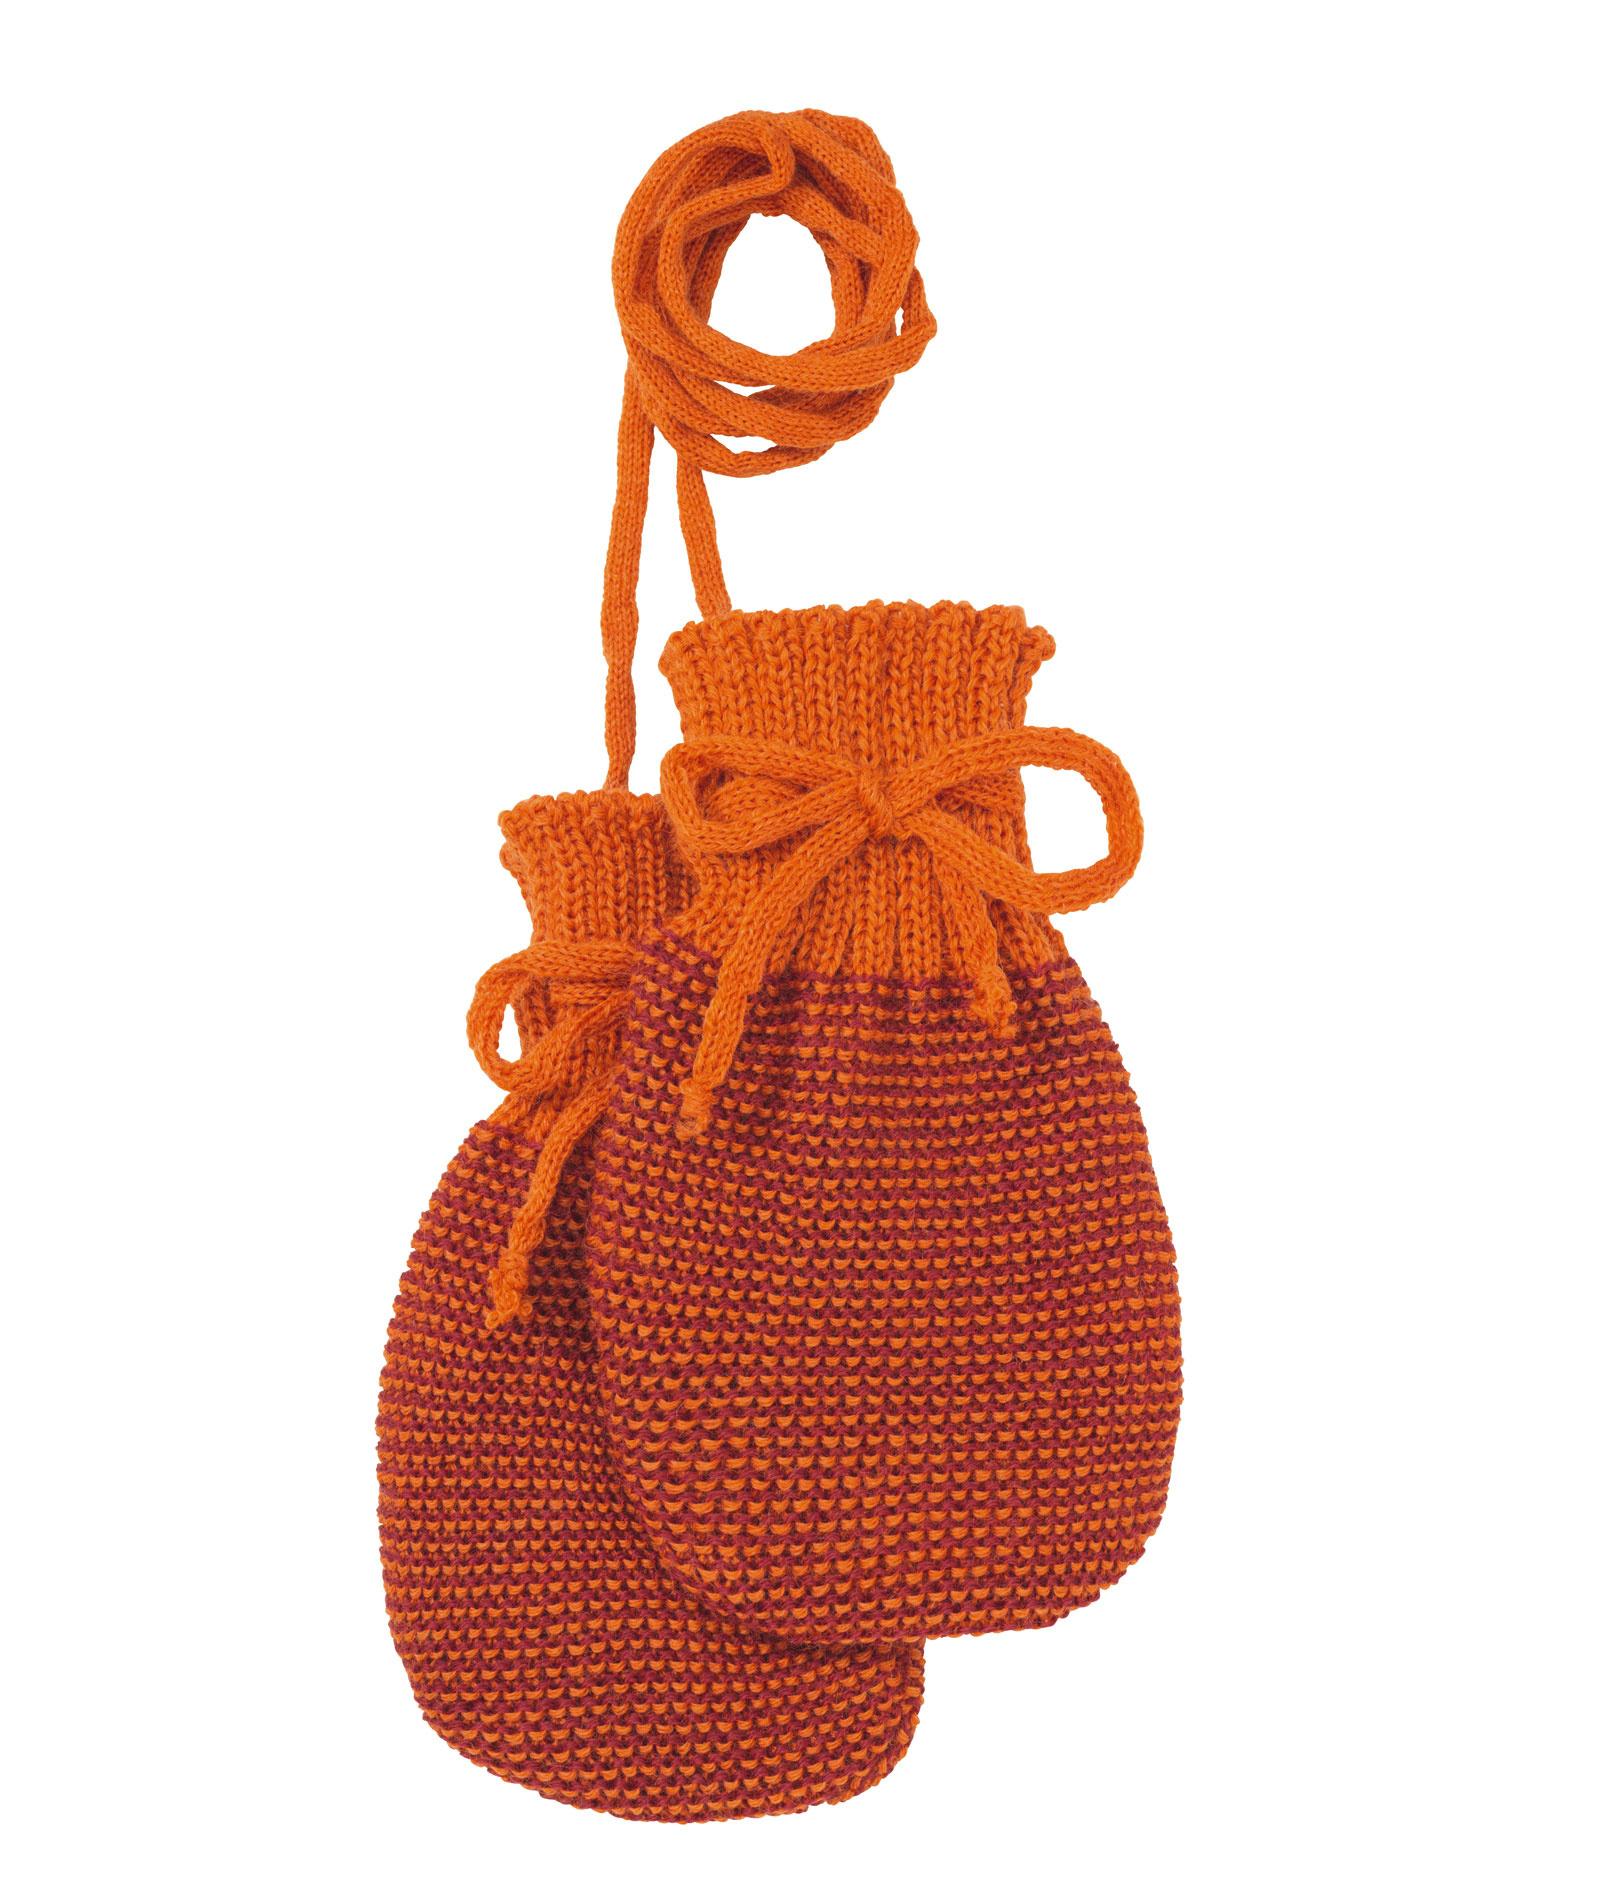 Disana Disana baby wantjes - Orange/Bordeaux (973)